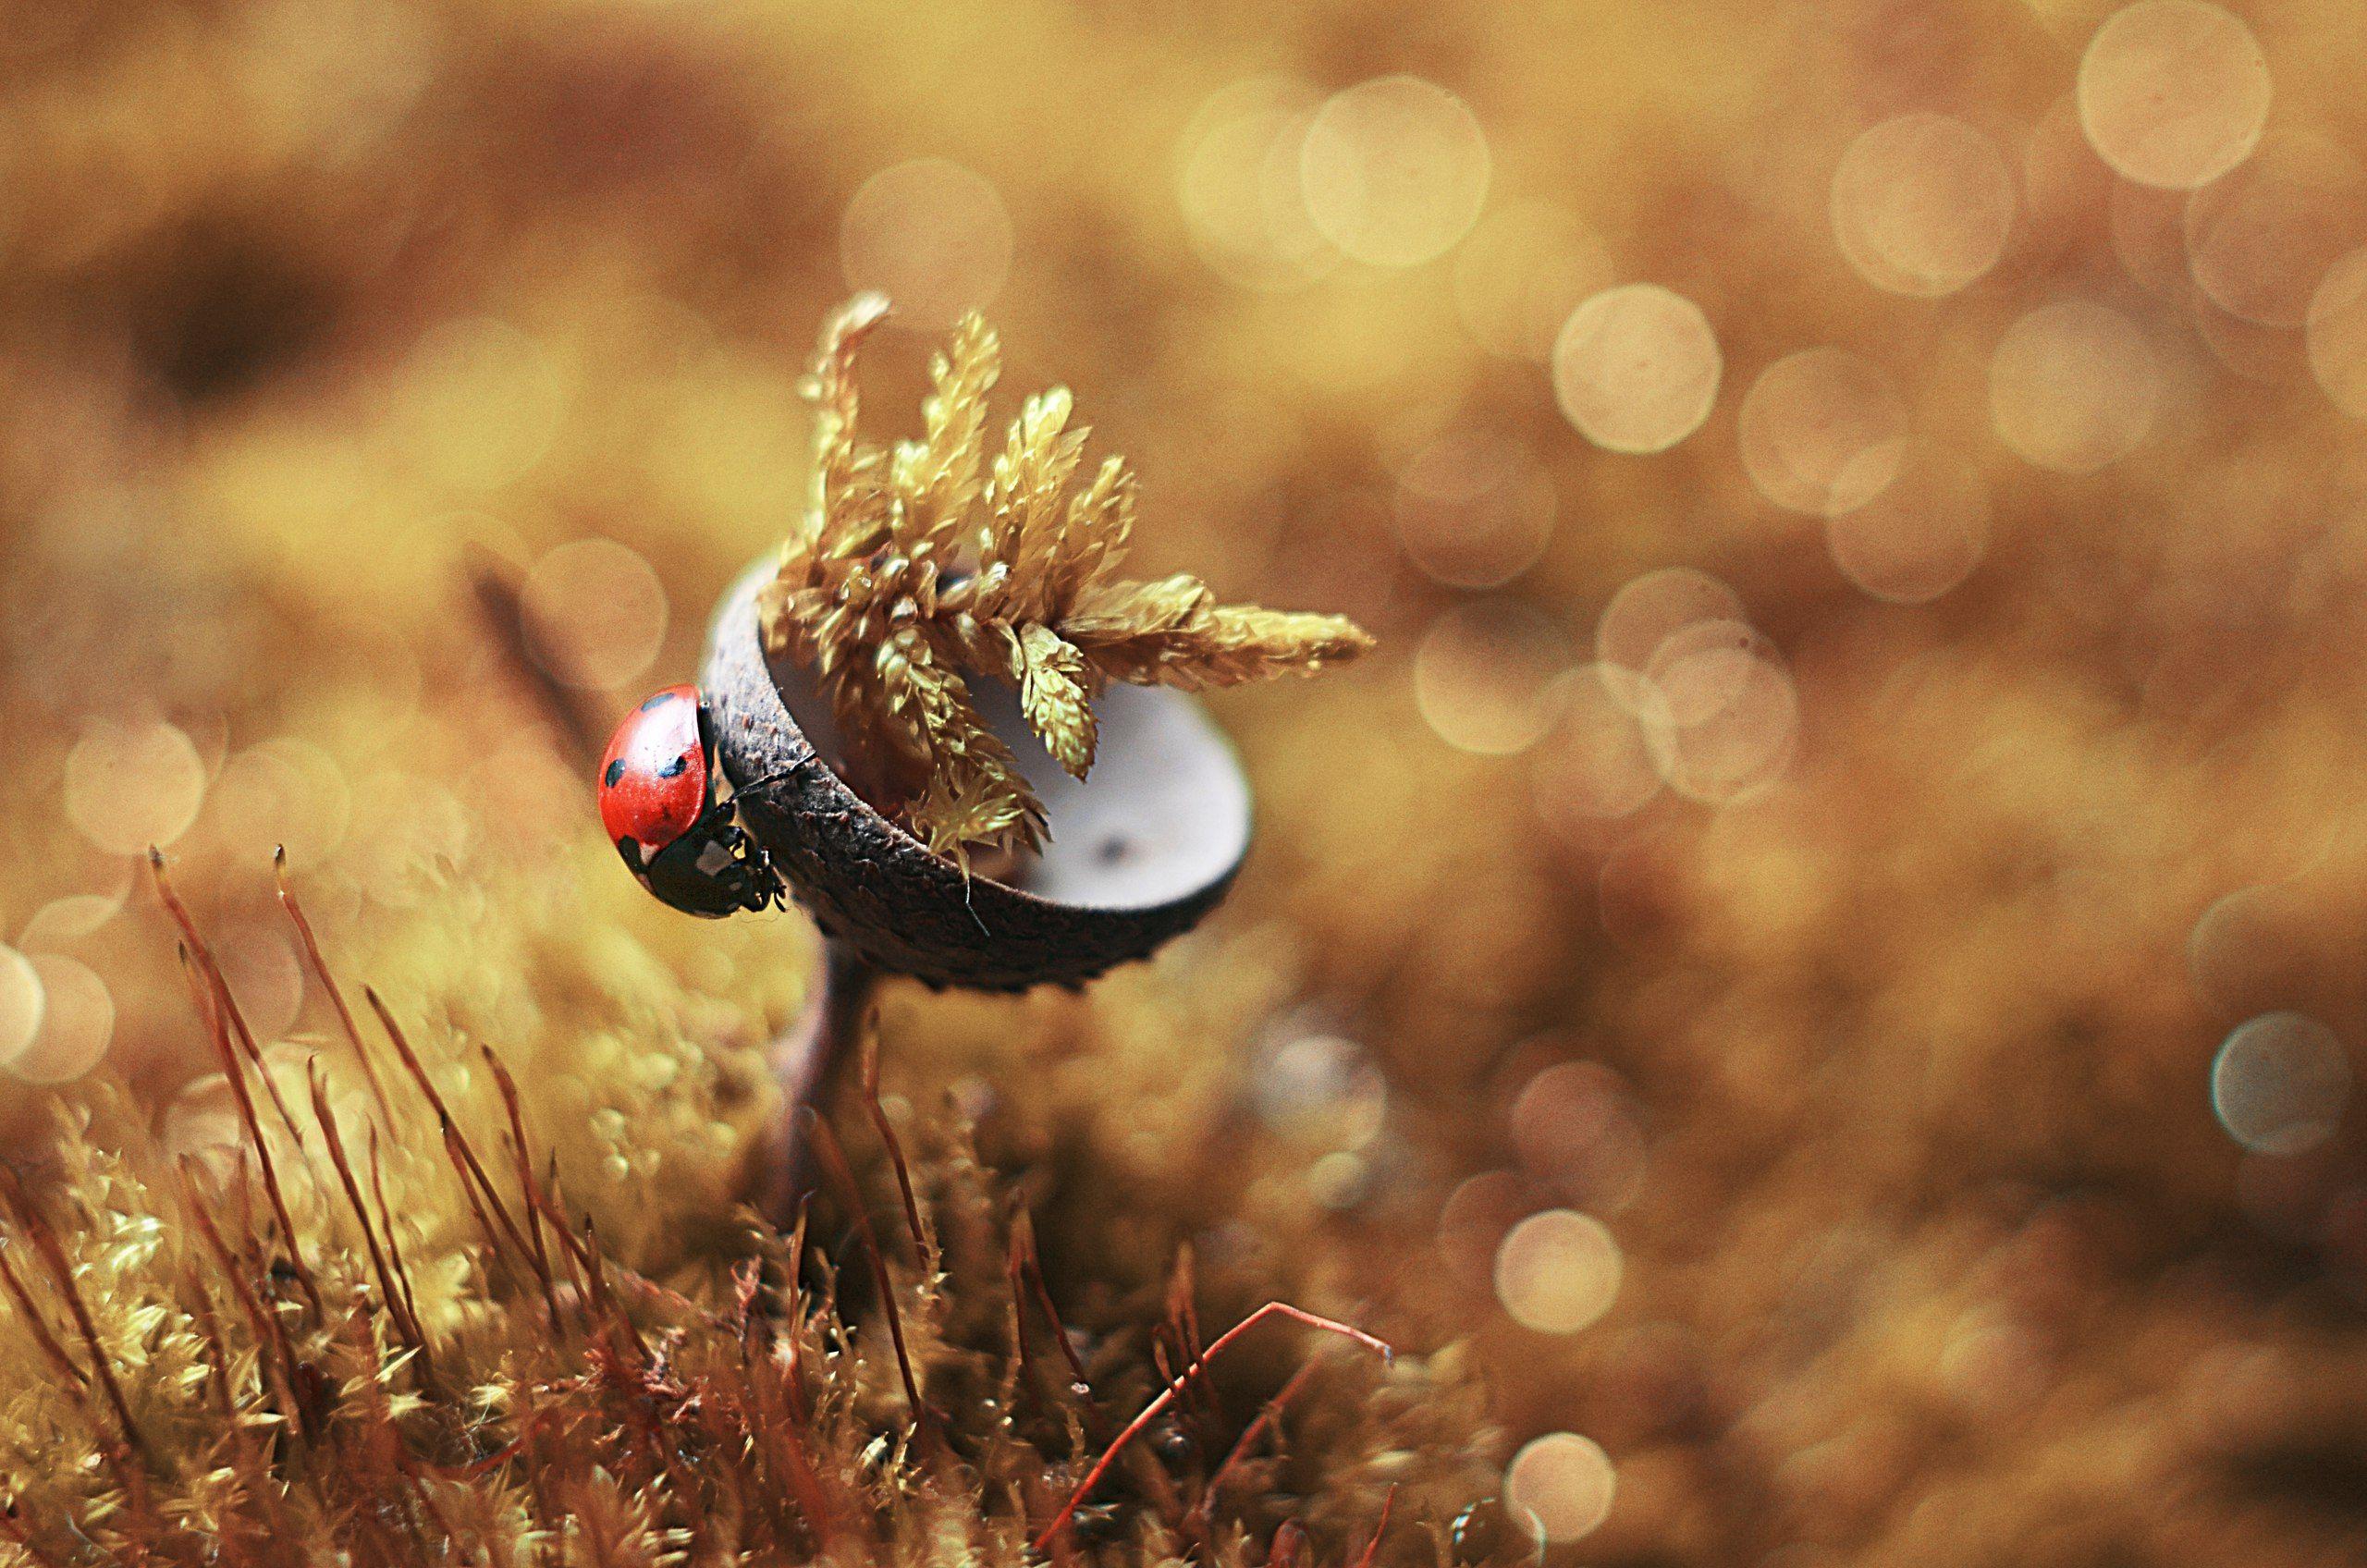 макро, жук, желтый, красиво, божья коровка, фотогография, Лапшина Владлена